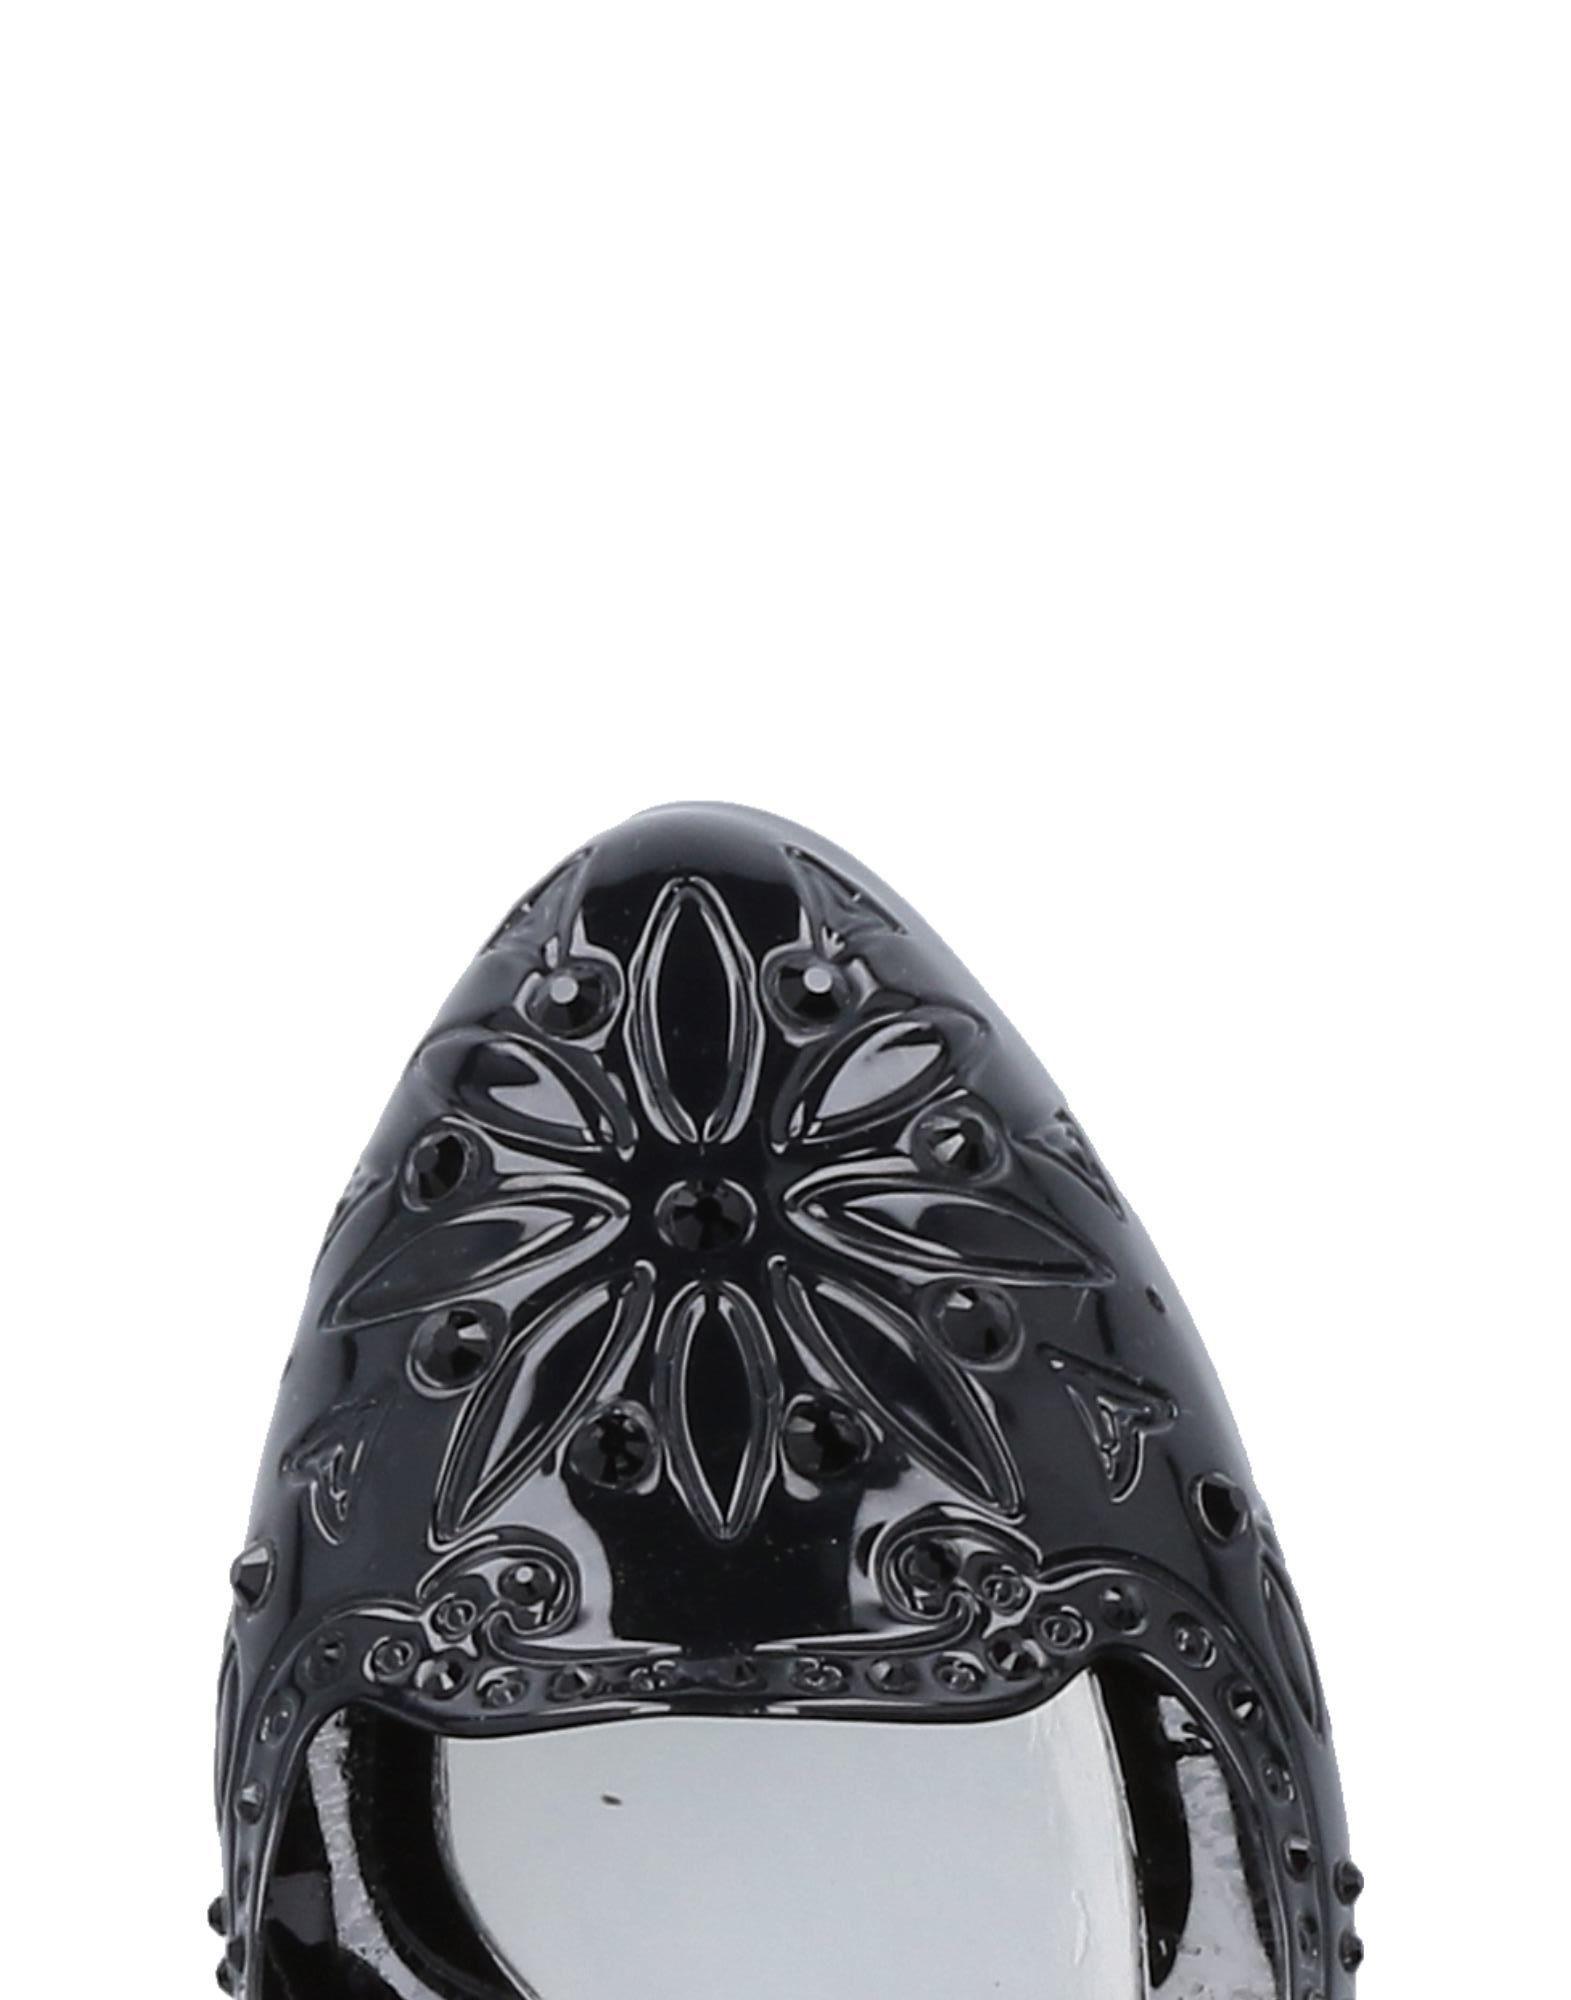 Dolce & Gabbana Mokassins Schuhe Damen  11505300GO Neue Schuhe Mokassins 88649c